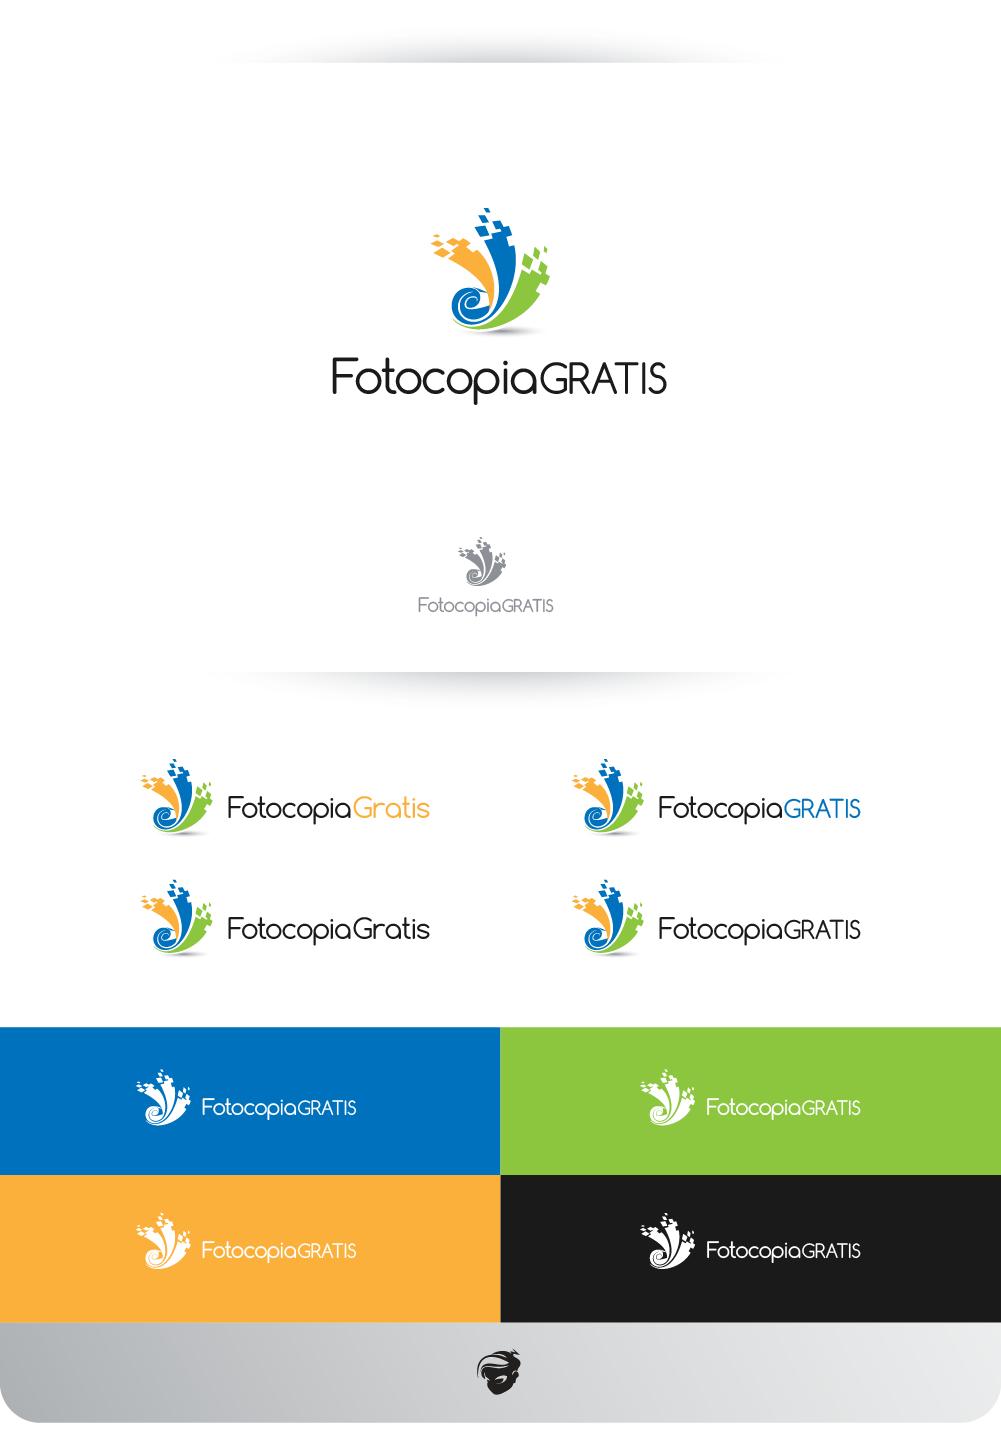 Logo Design by zesthar - Entry No. 255 in the Logo Design Contest Inspiring Logo Design for Fotocopiagratis.